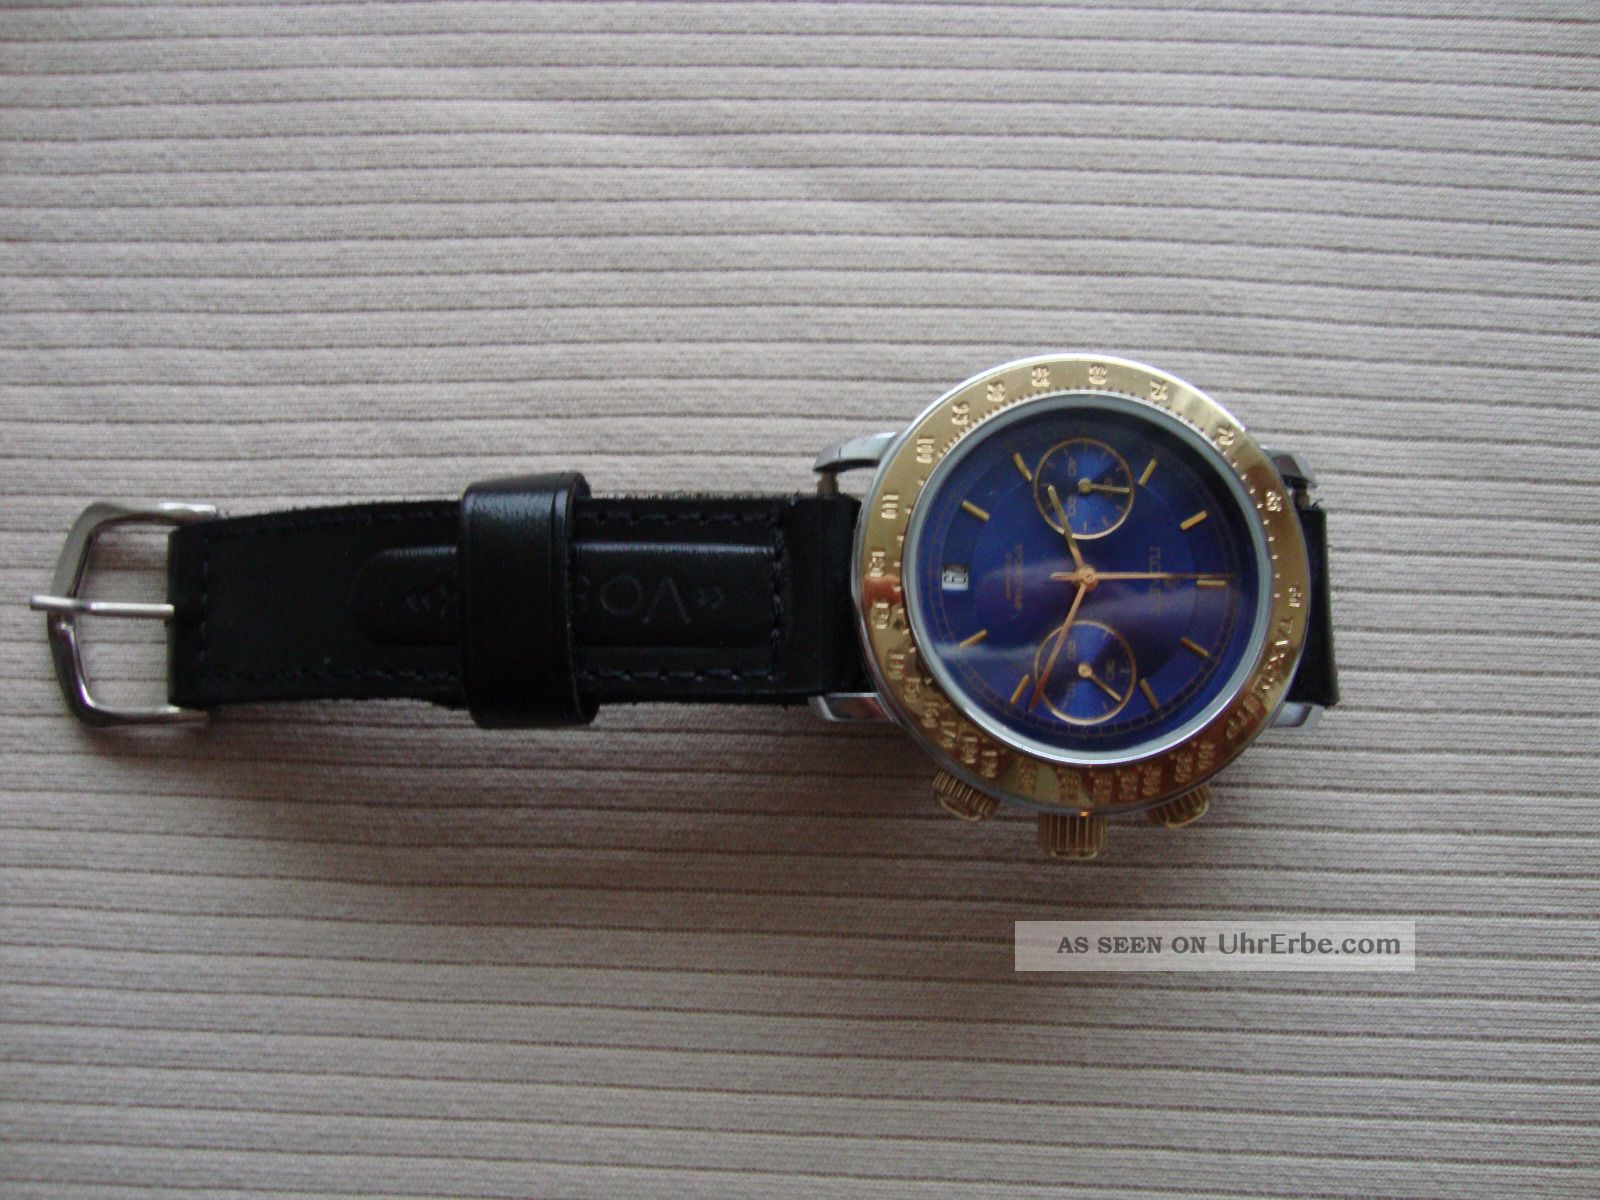 Poljot - Chronogaph Alter - Retro 1984 - 1999 Mechanisch Handaufzug Armbanduhren Bild